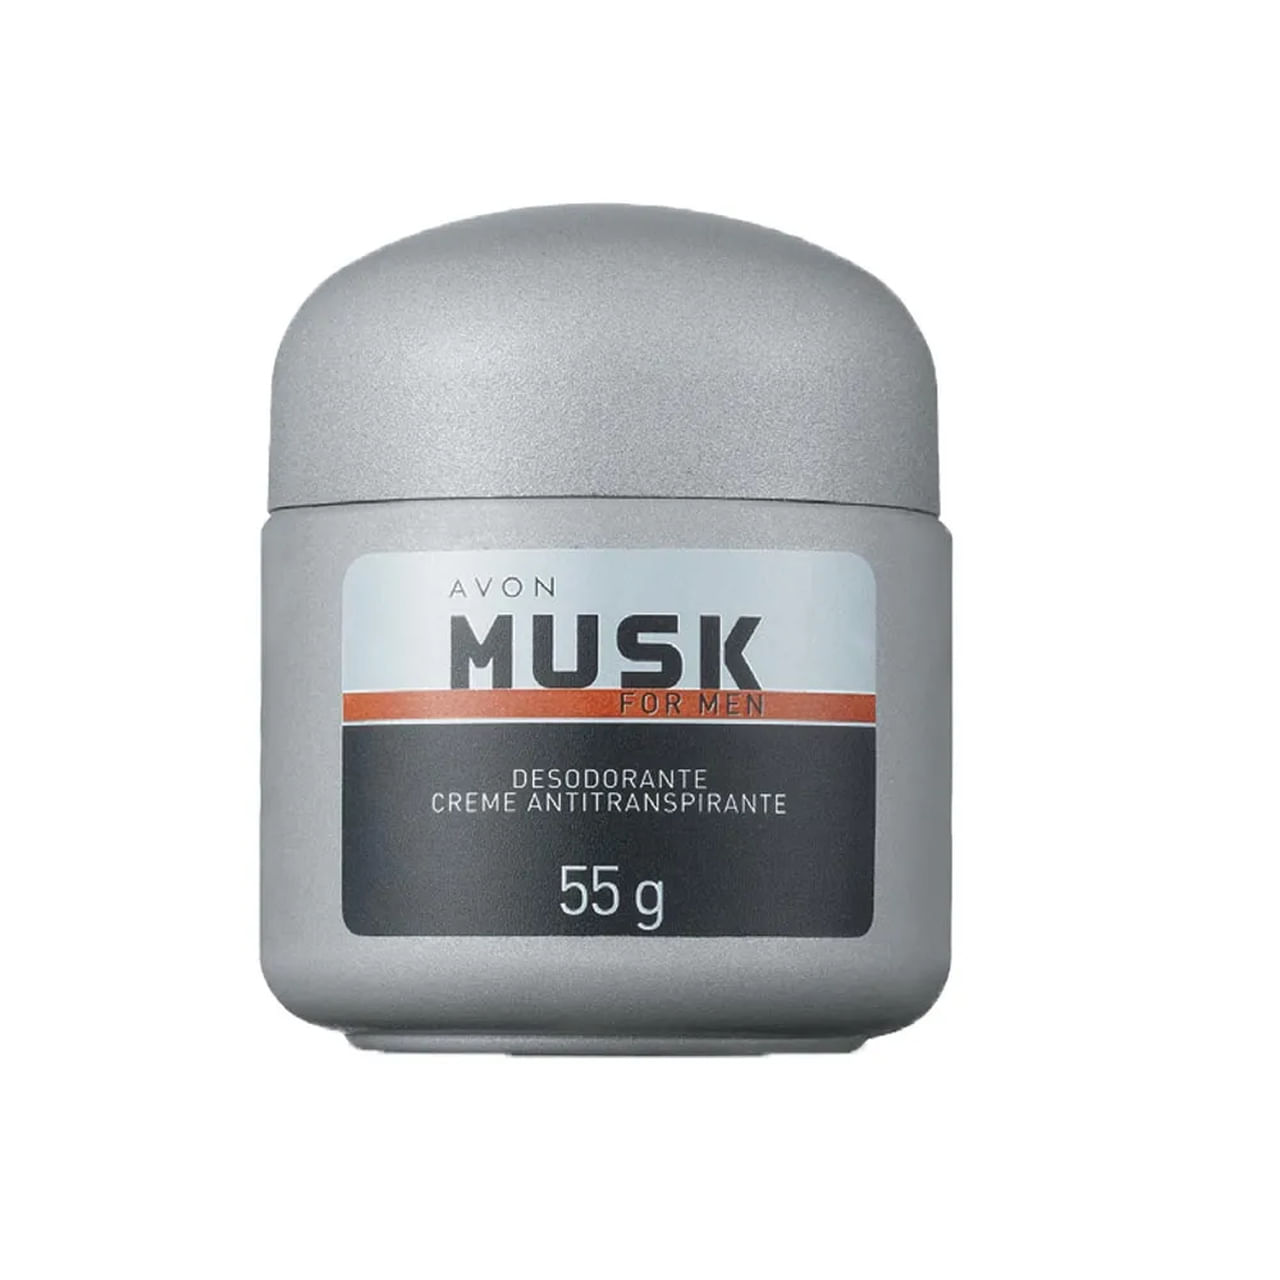 Desodorante Creme Mvusk For Men - 55 g Desodorante Creme Musk For Men - 55 g